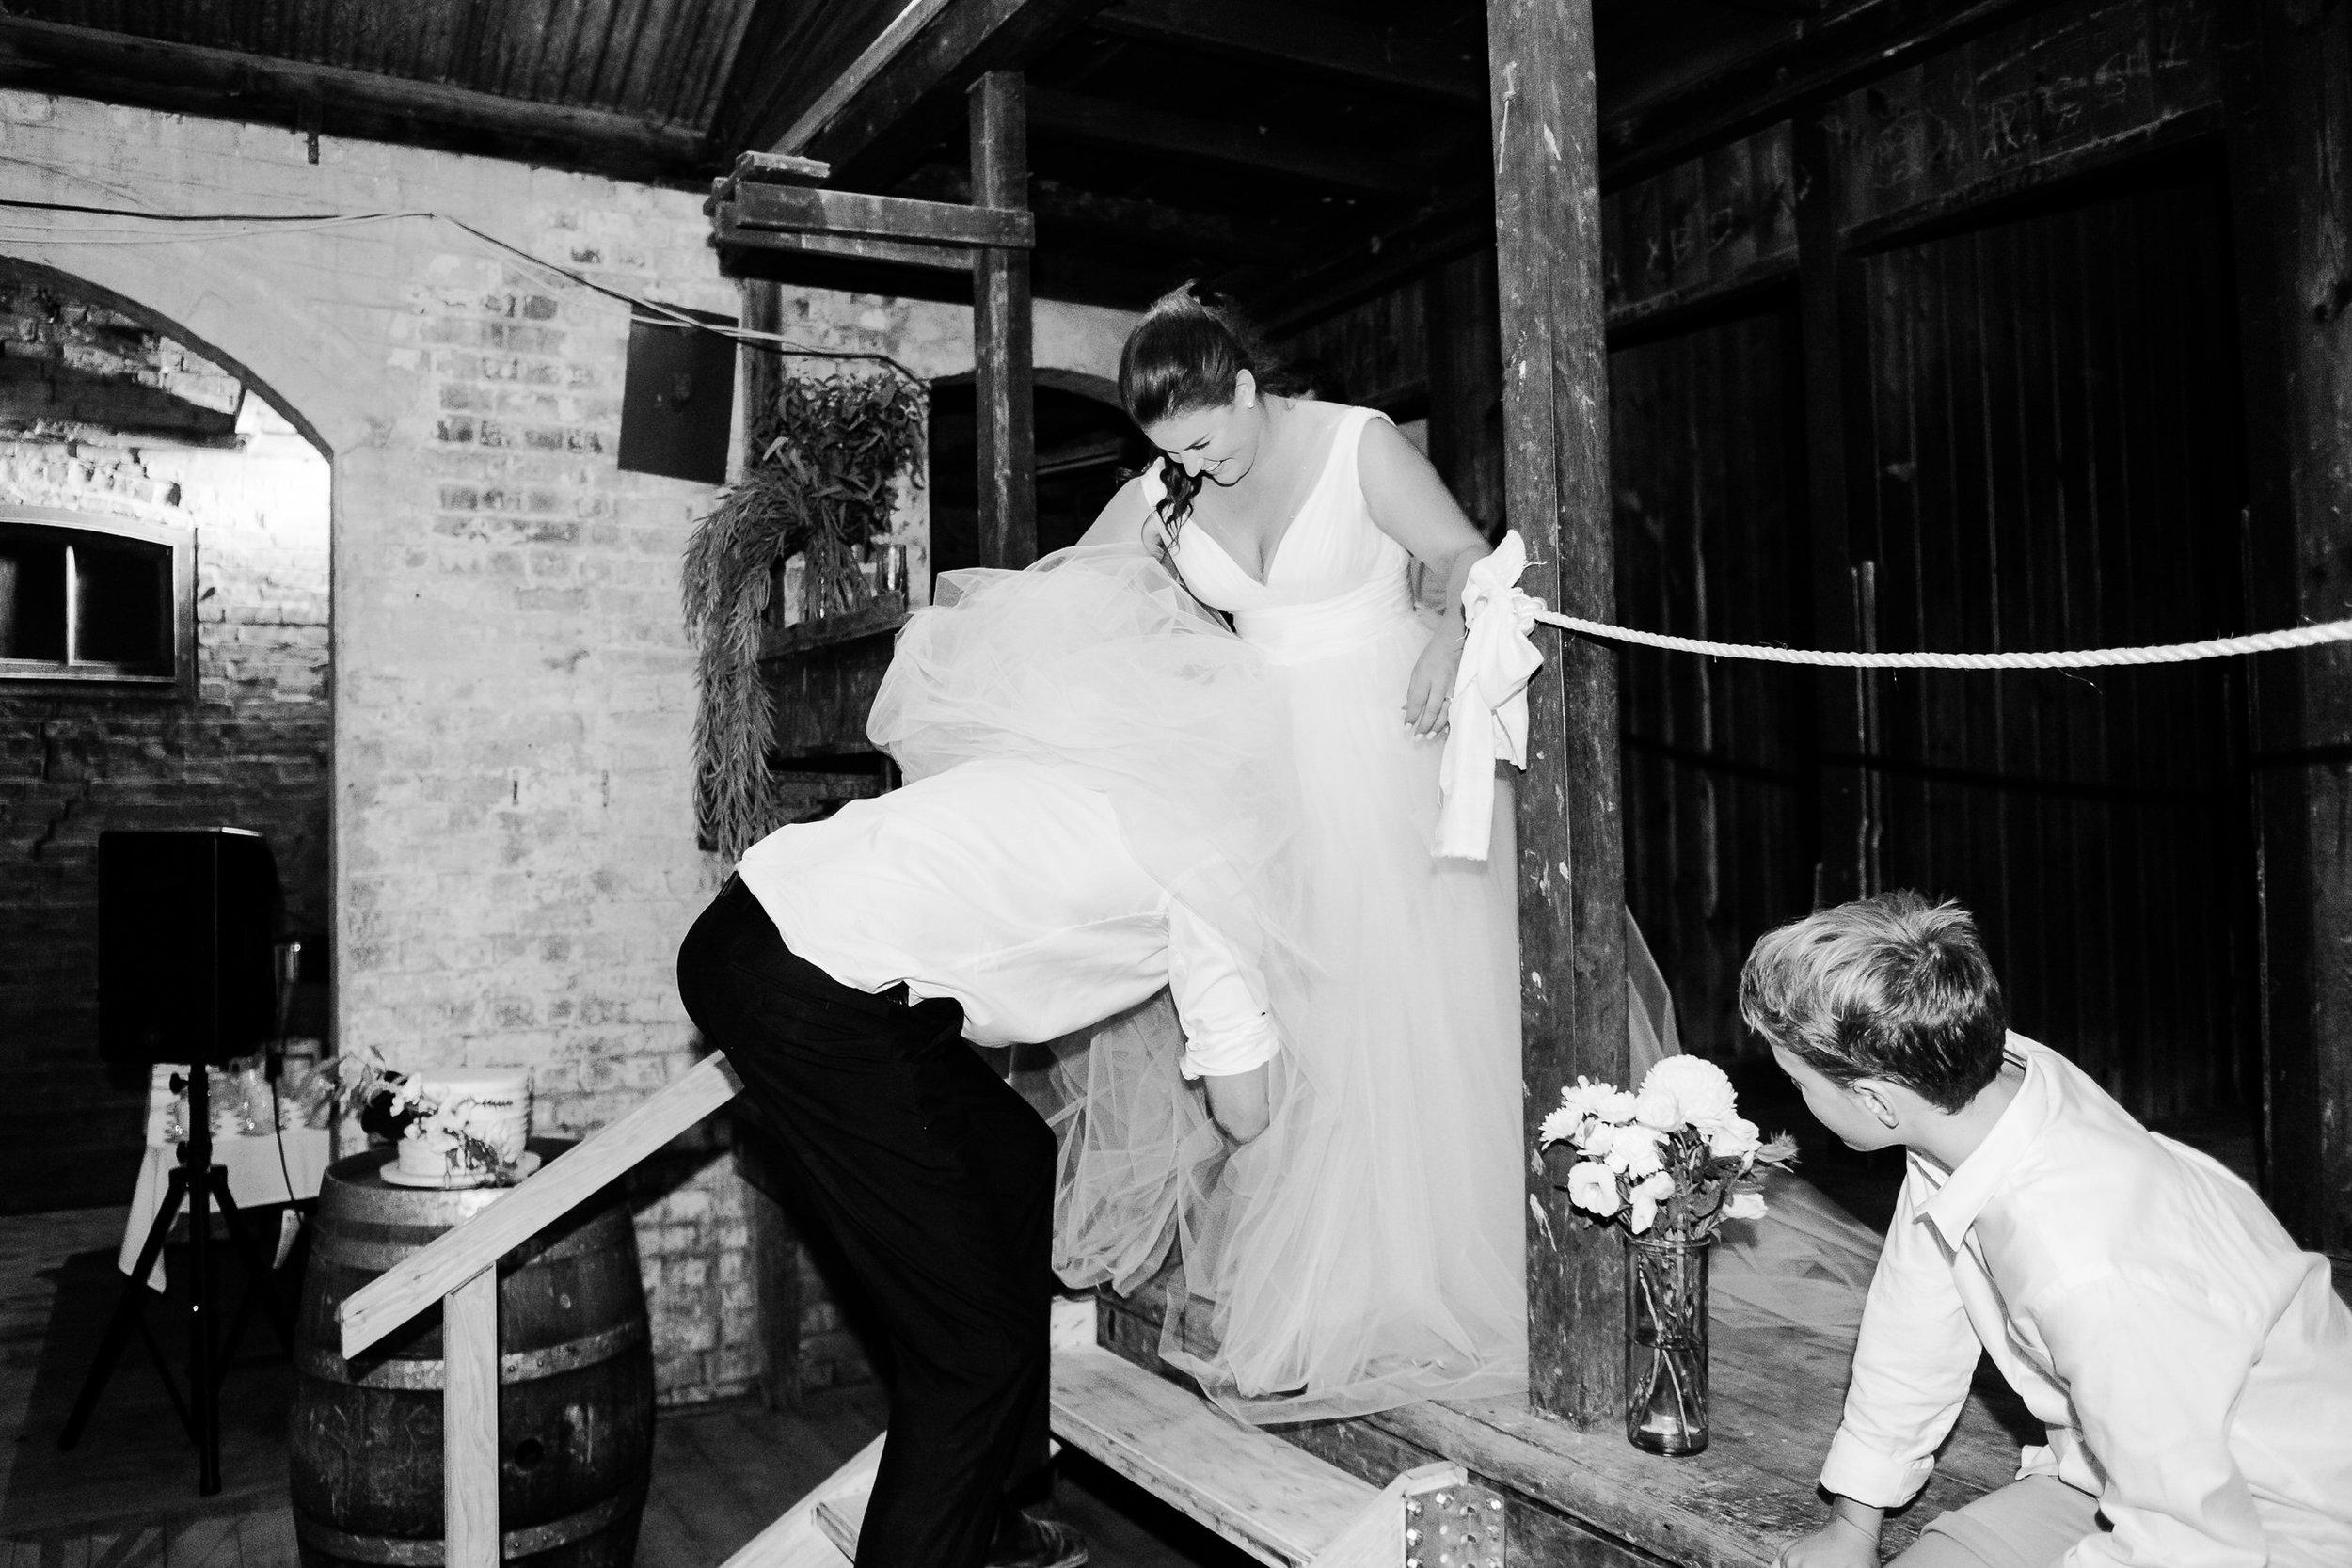 Justin_Jim_Wedding_DIY_Serpentine-201.JPG